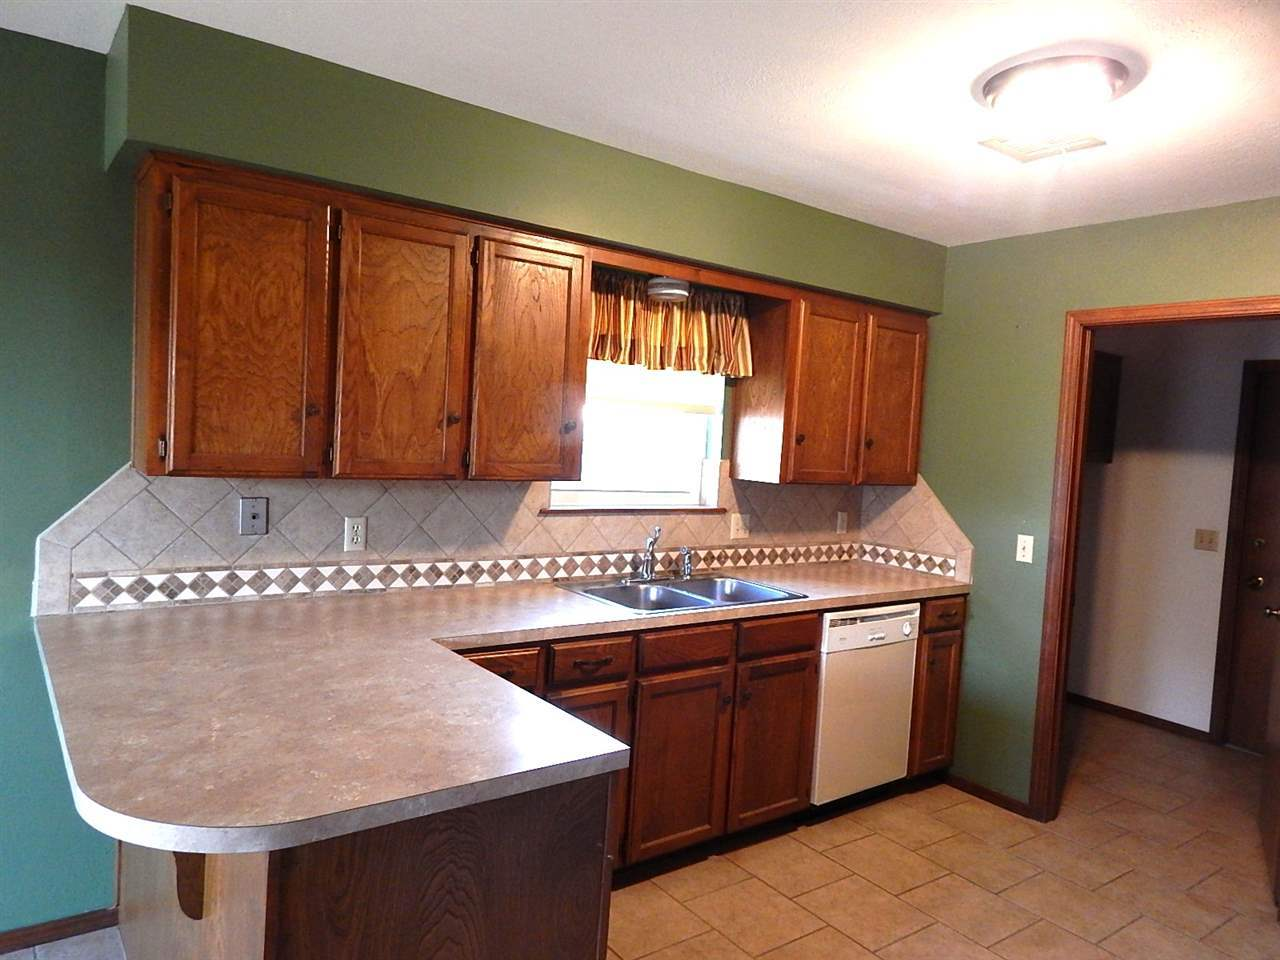 Sold Cross Sale W/ MLS | 2312 Calvert Ponca City, OK 74601 9